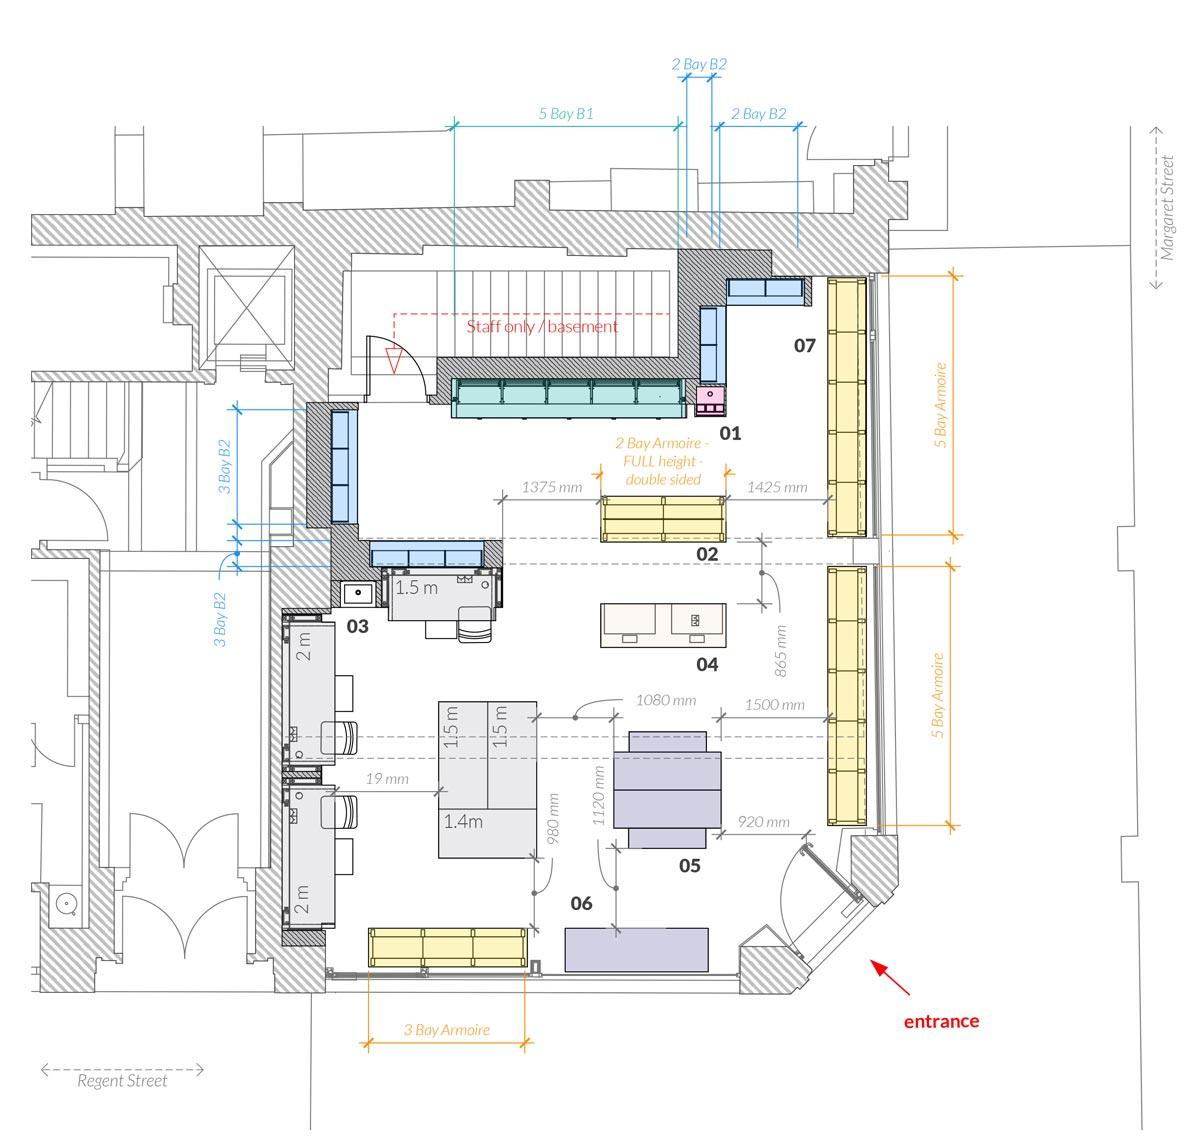 Space NK Regent Street Plans